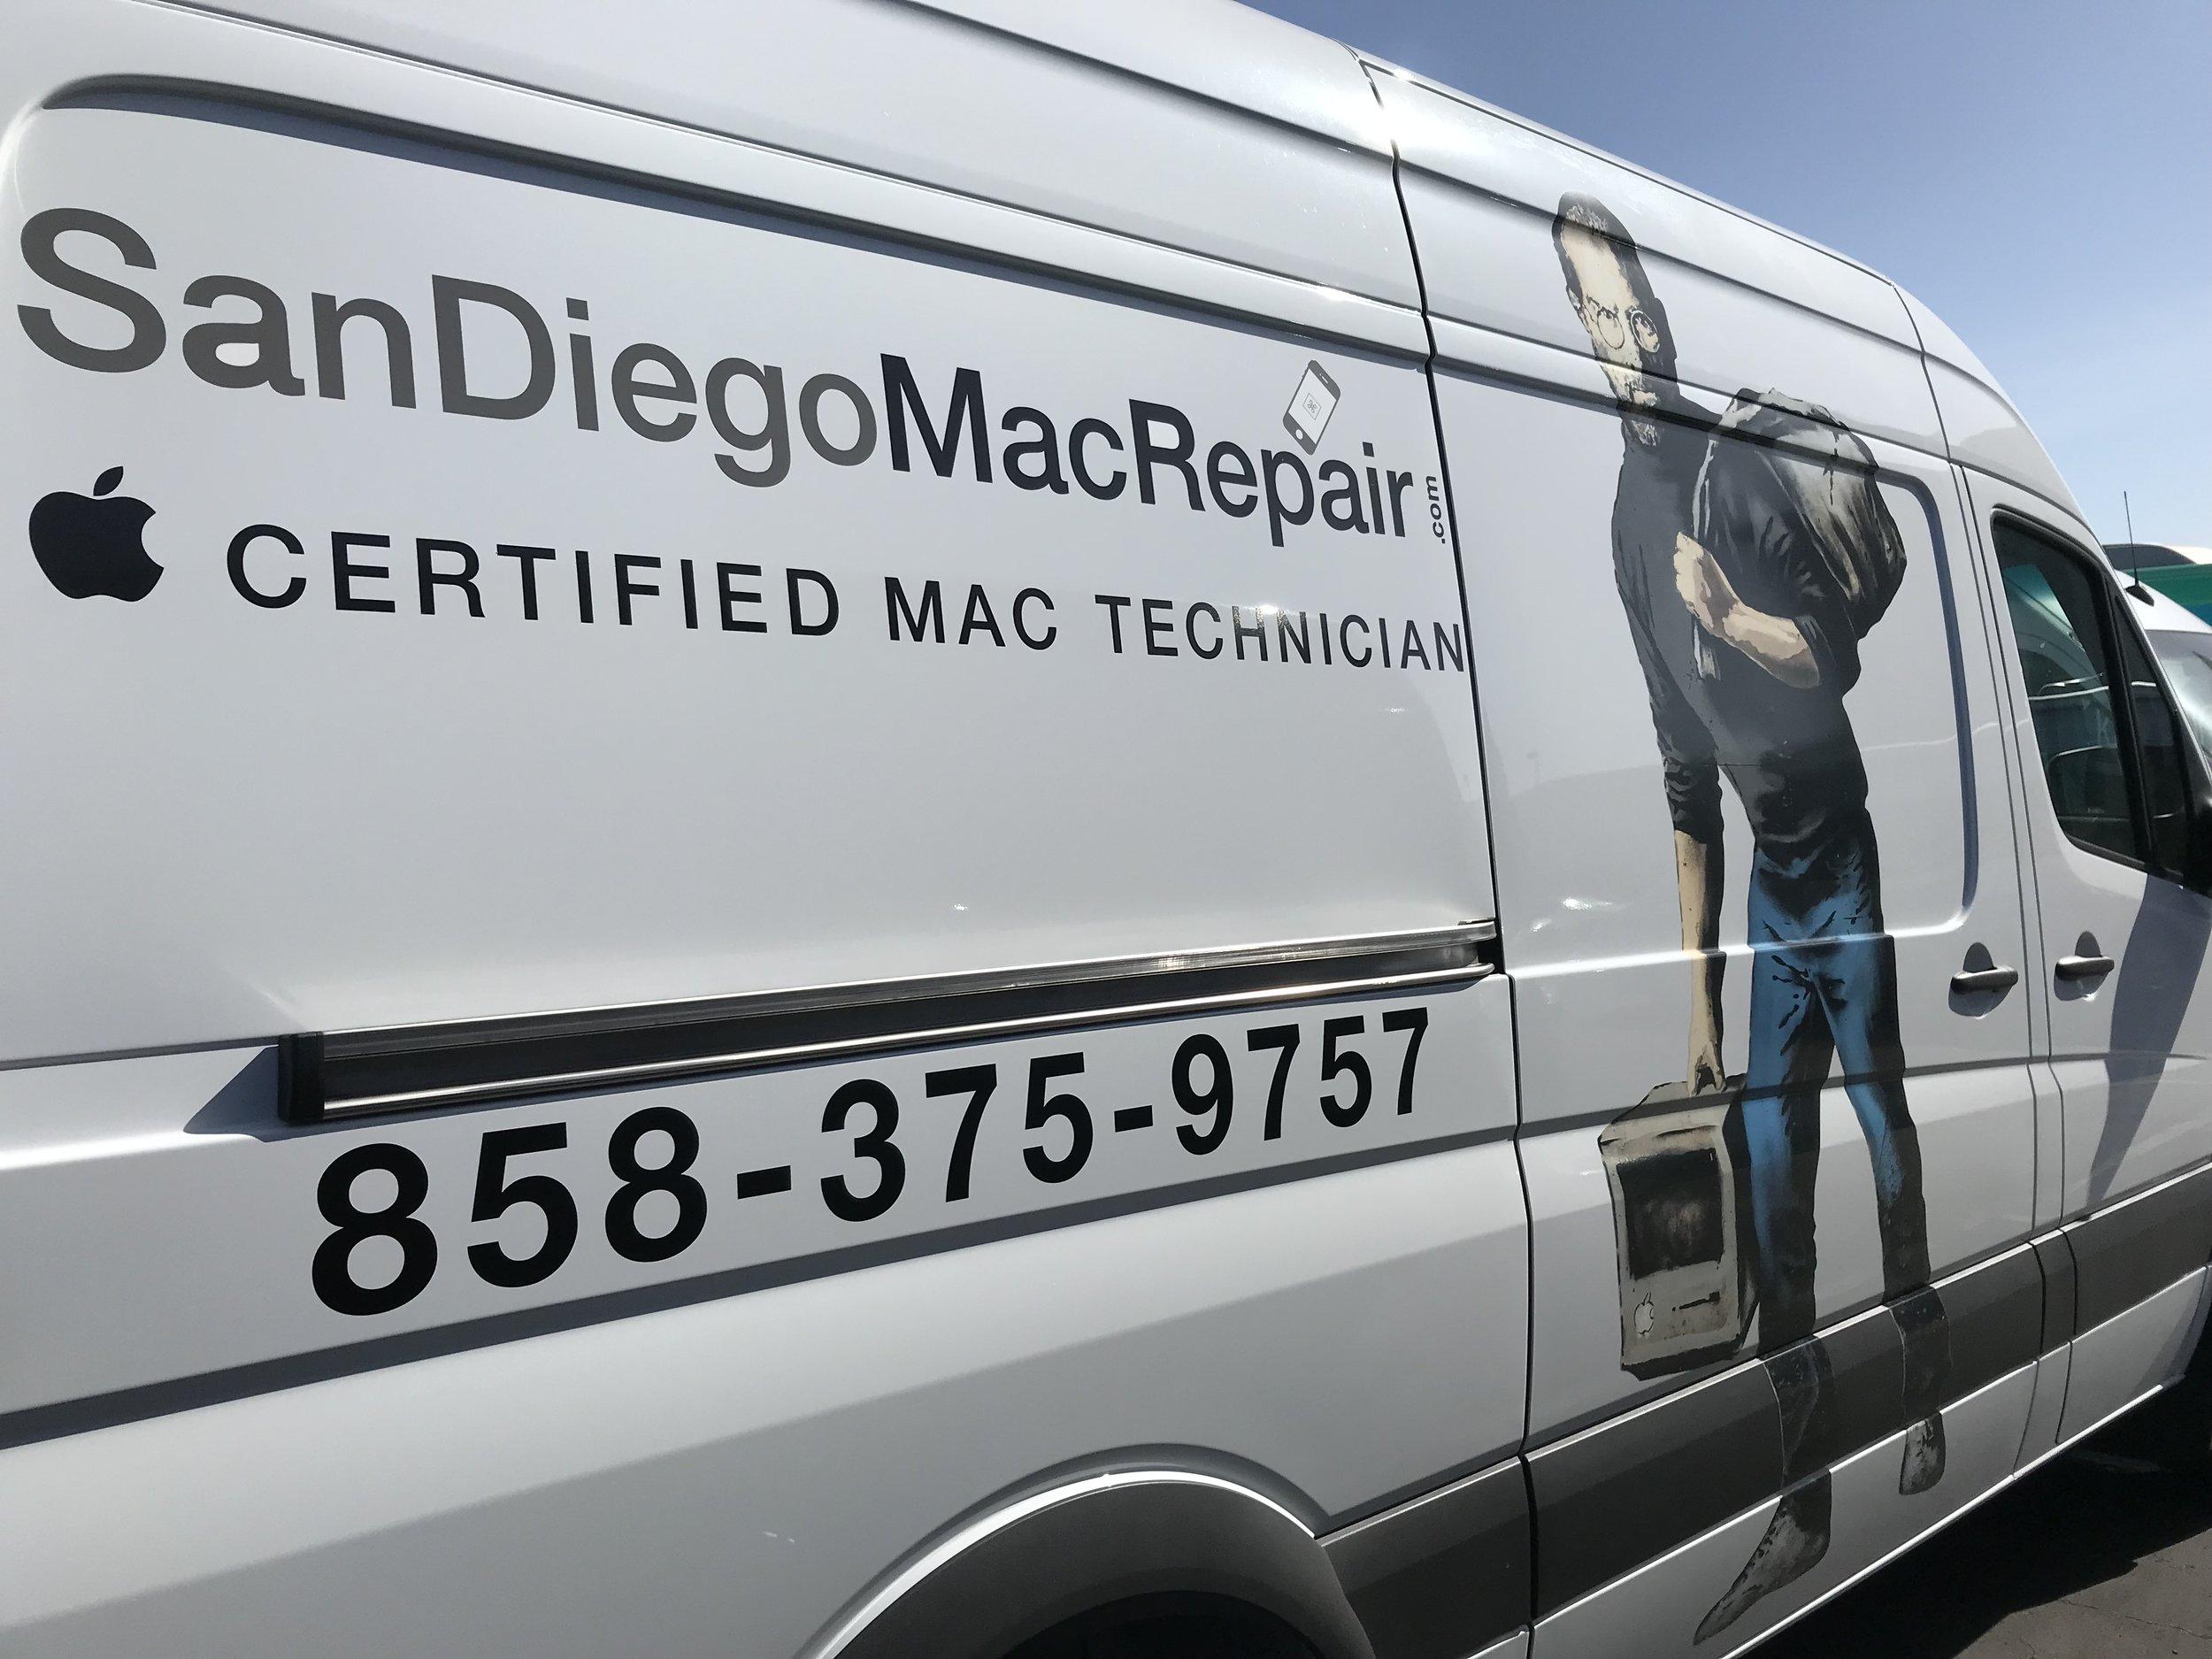 San Diego Mac repair in Eastlake Chula Vista San Diego. macbook repair eastlake Mac repair Chula Vista fast cracked screen water damage LCD apple certified repair in Chula Vista